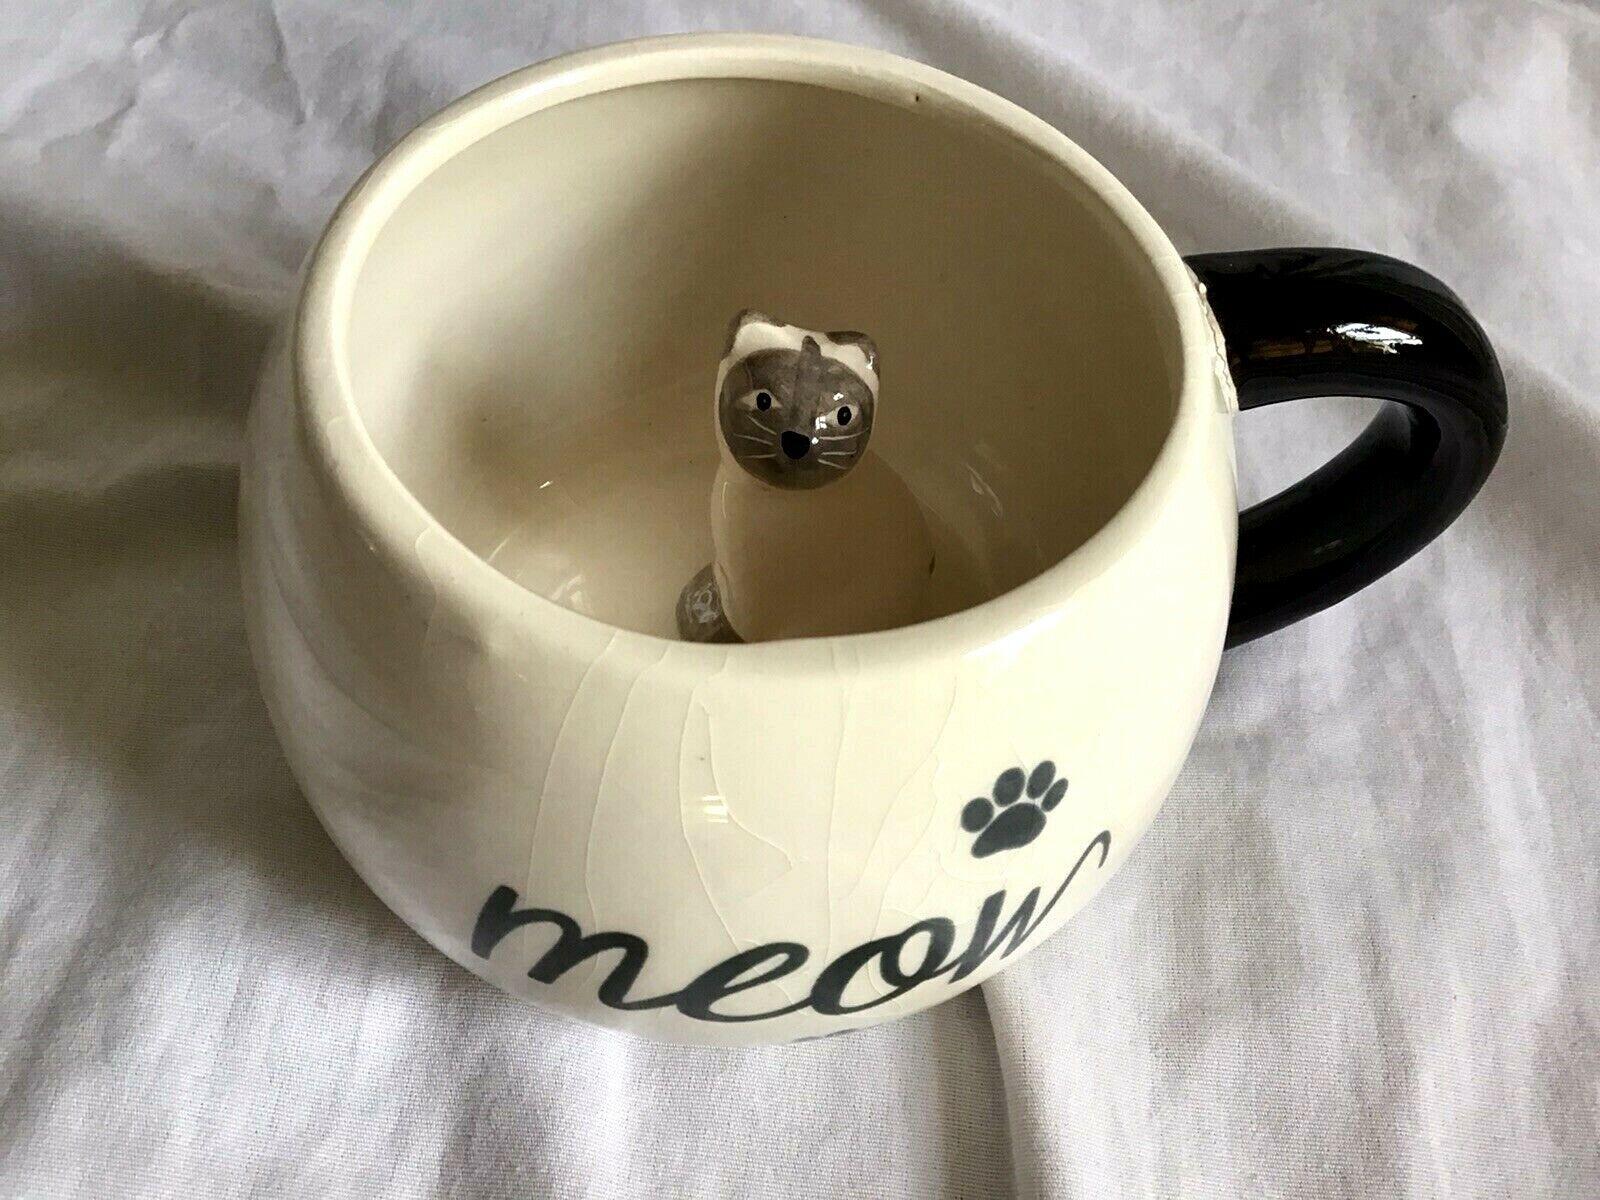 WORLD MARKET Surprise MEOW Cat Inside Mug Coffee Mug Tan Ceramic Jumbo 17 Oz EUC - $6.95